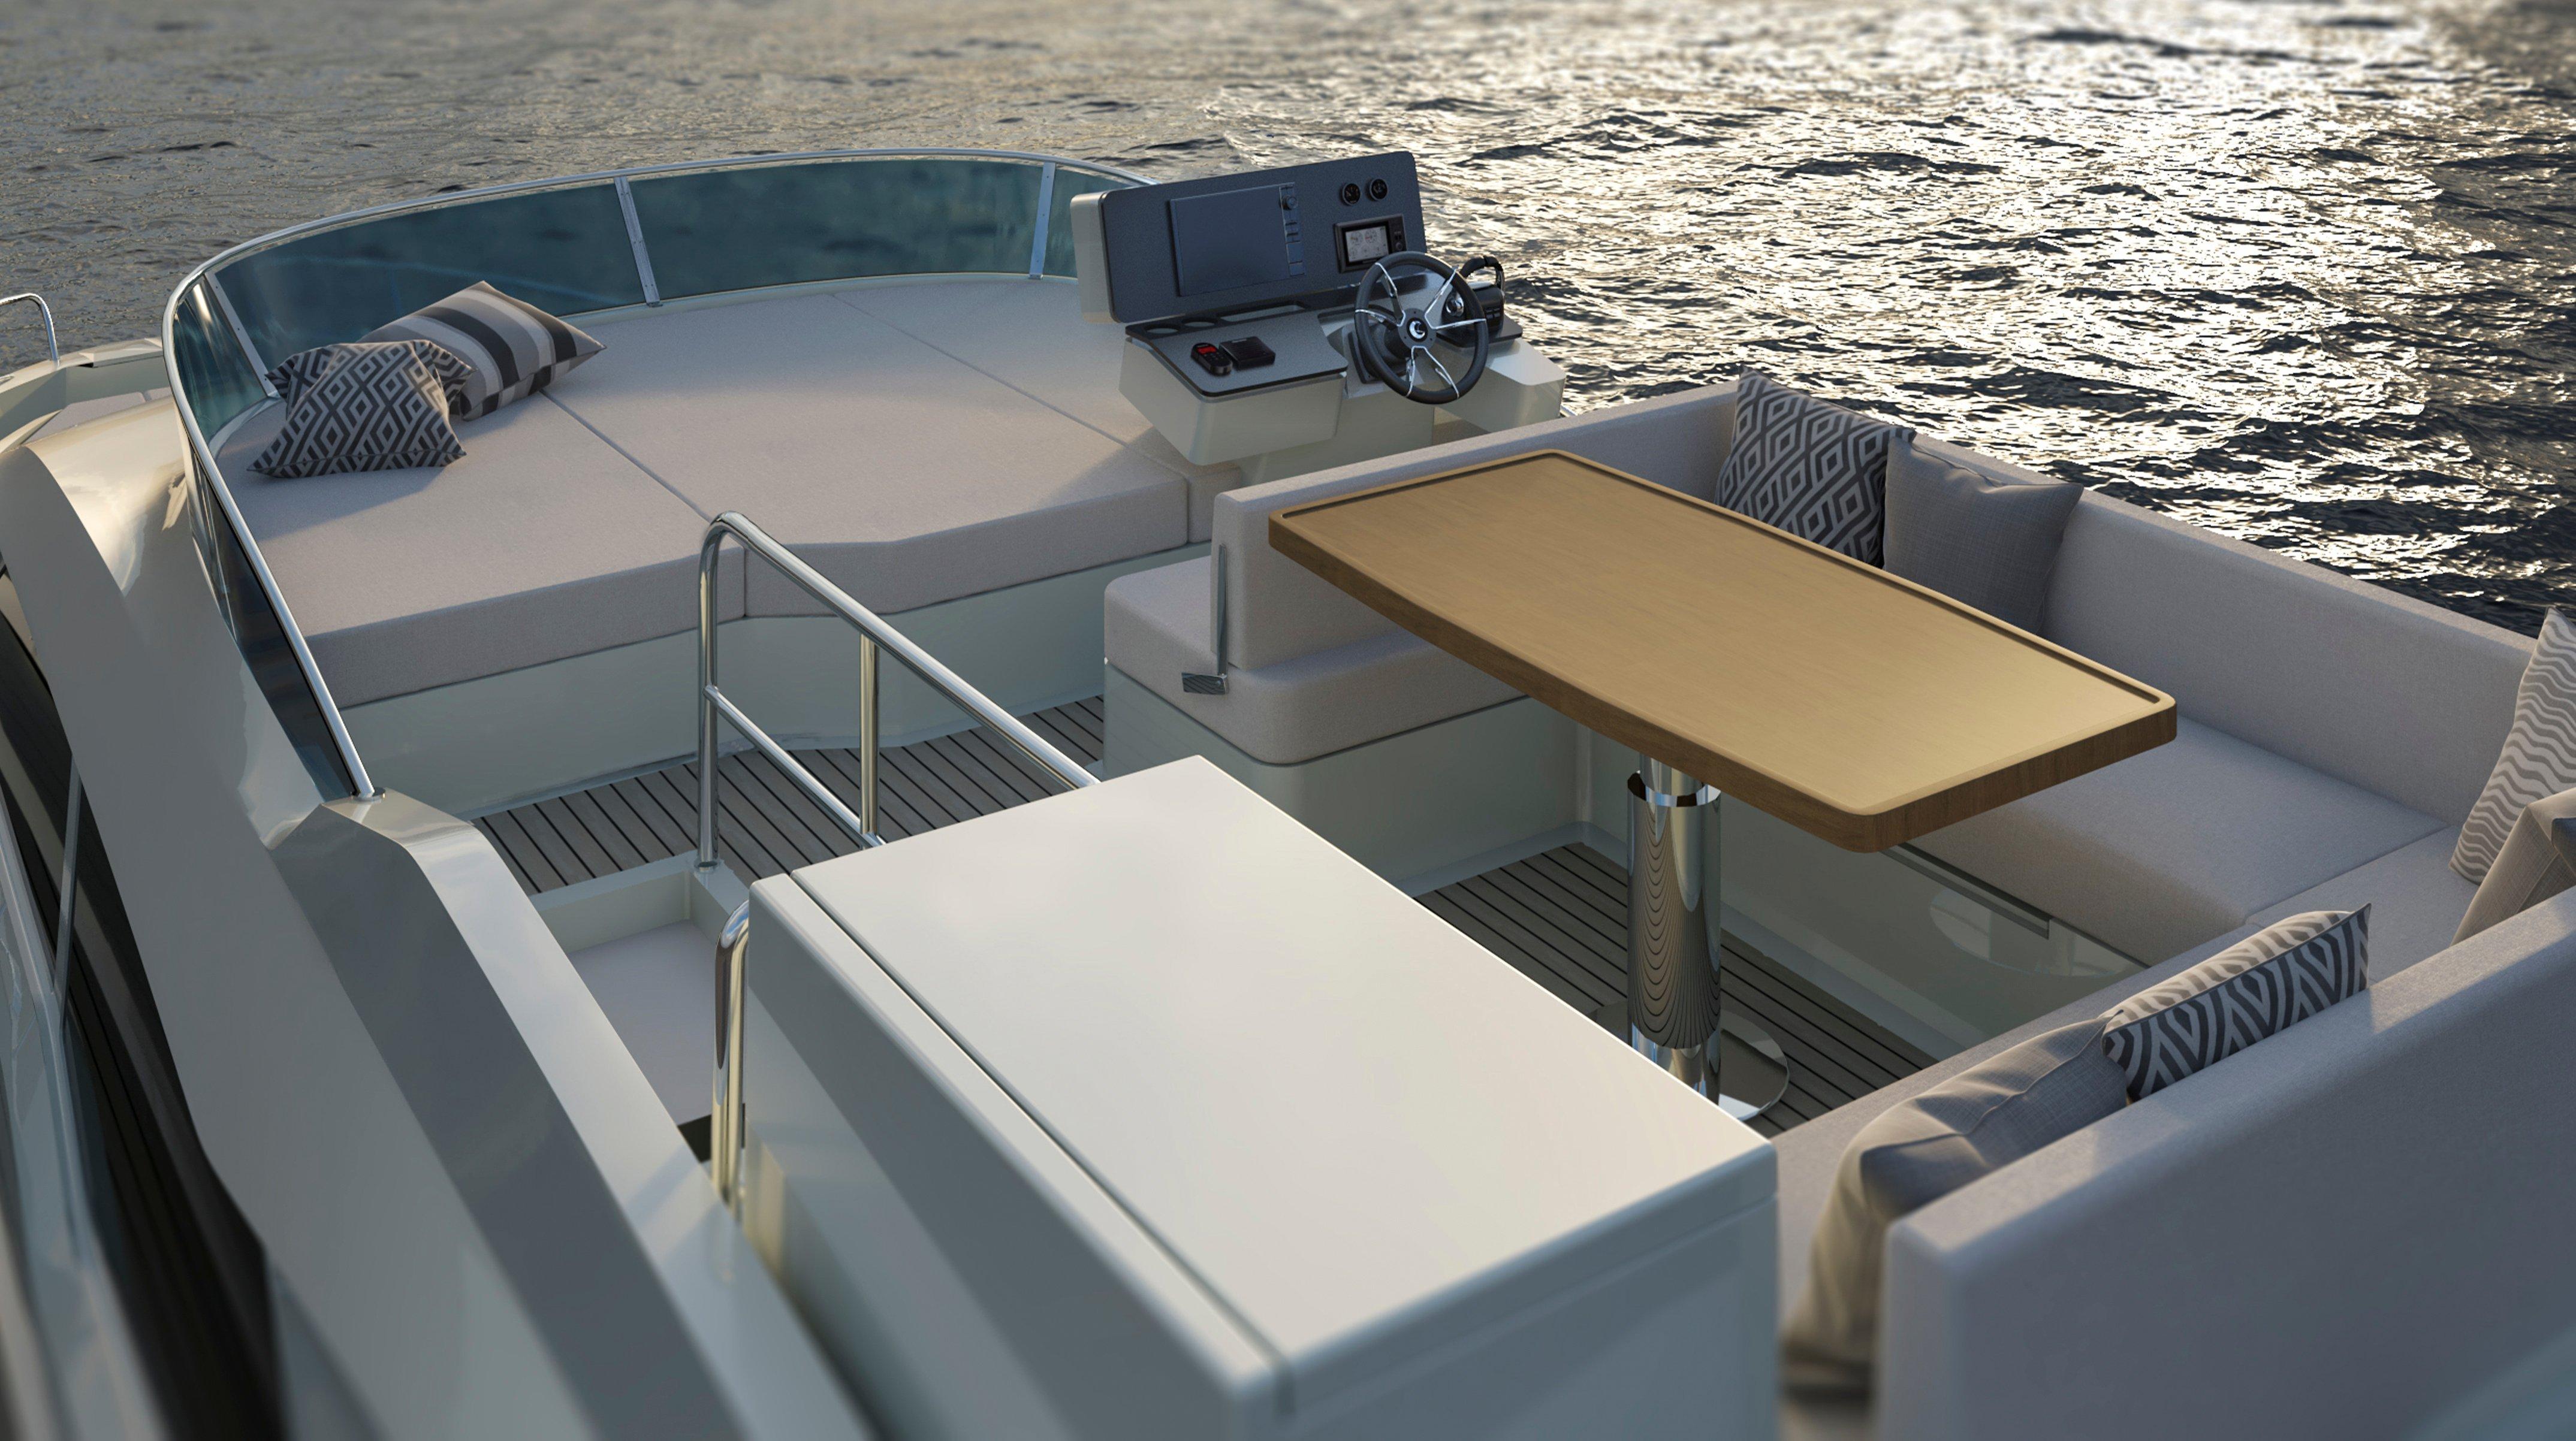 Majesty 49 Yacht in UAE